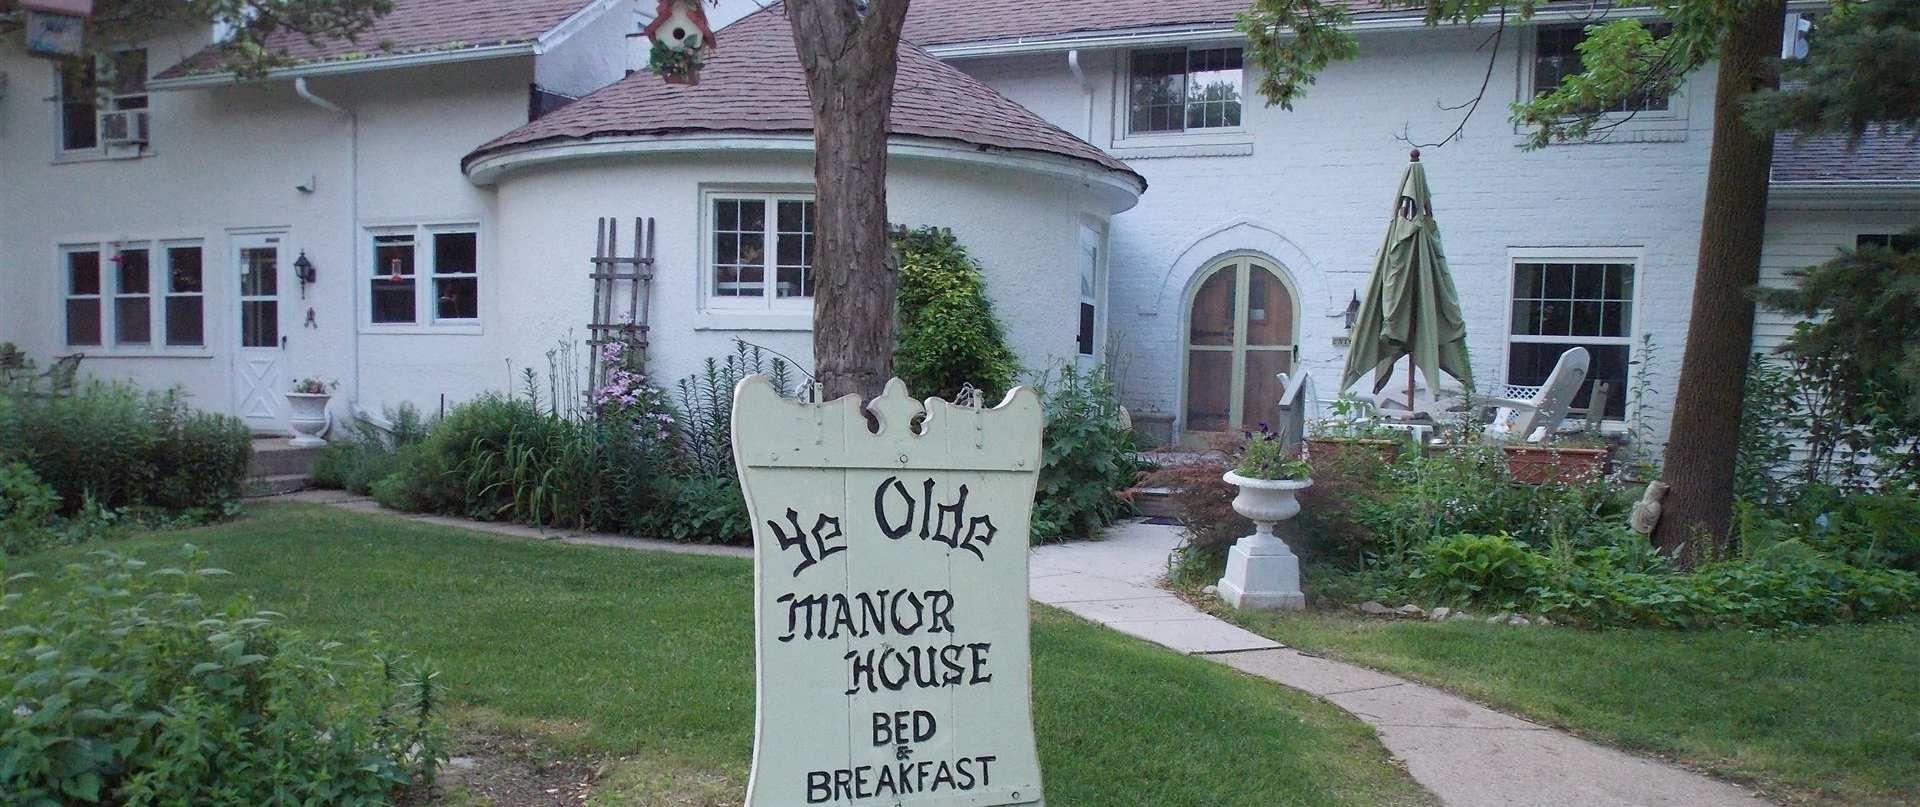 Ye Old Manor House vegan B&B in Elkhorn, WI Indoor